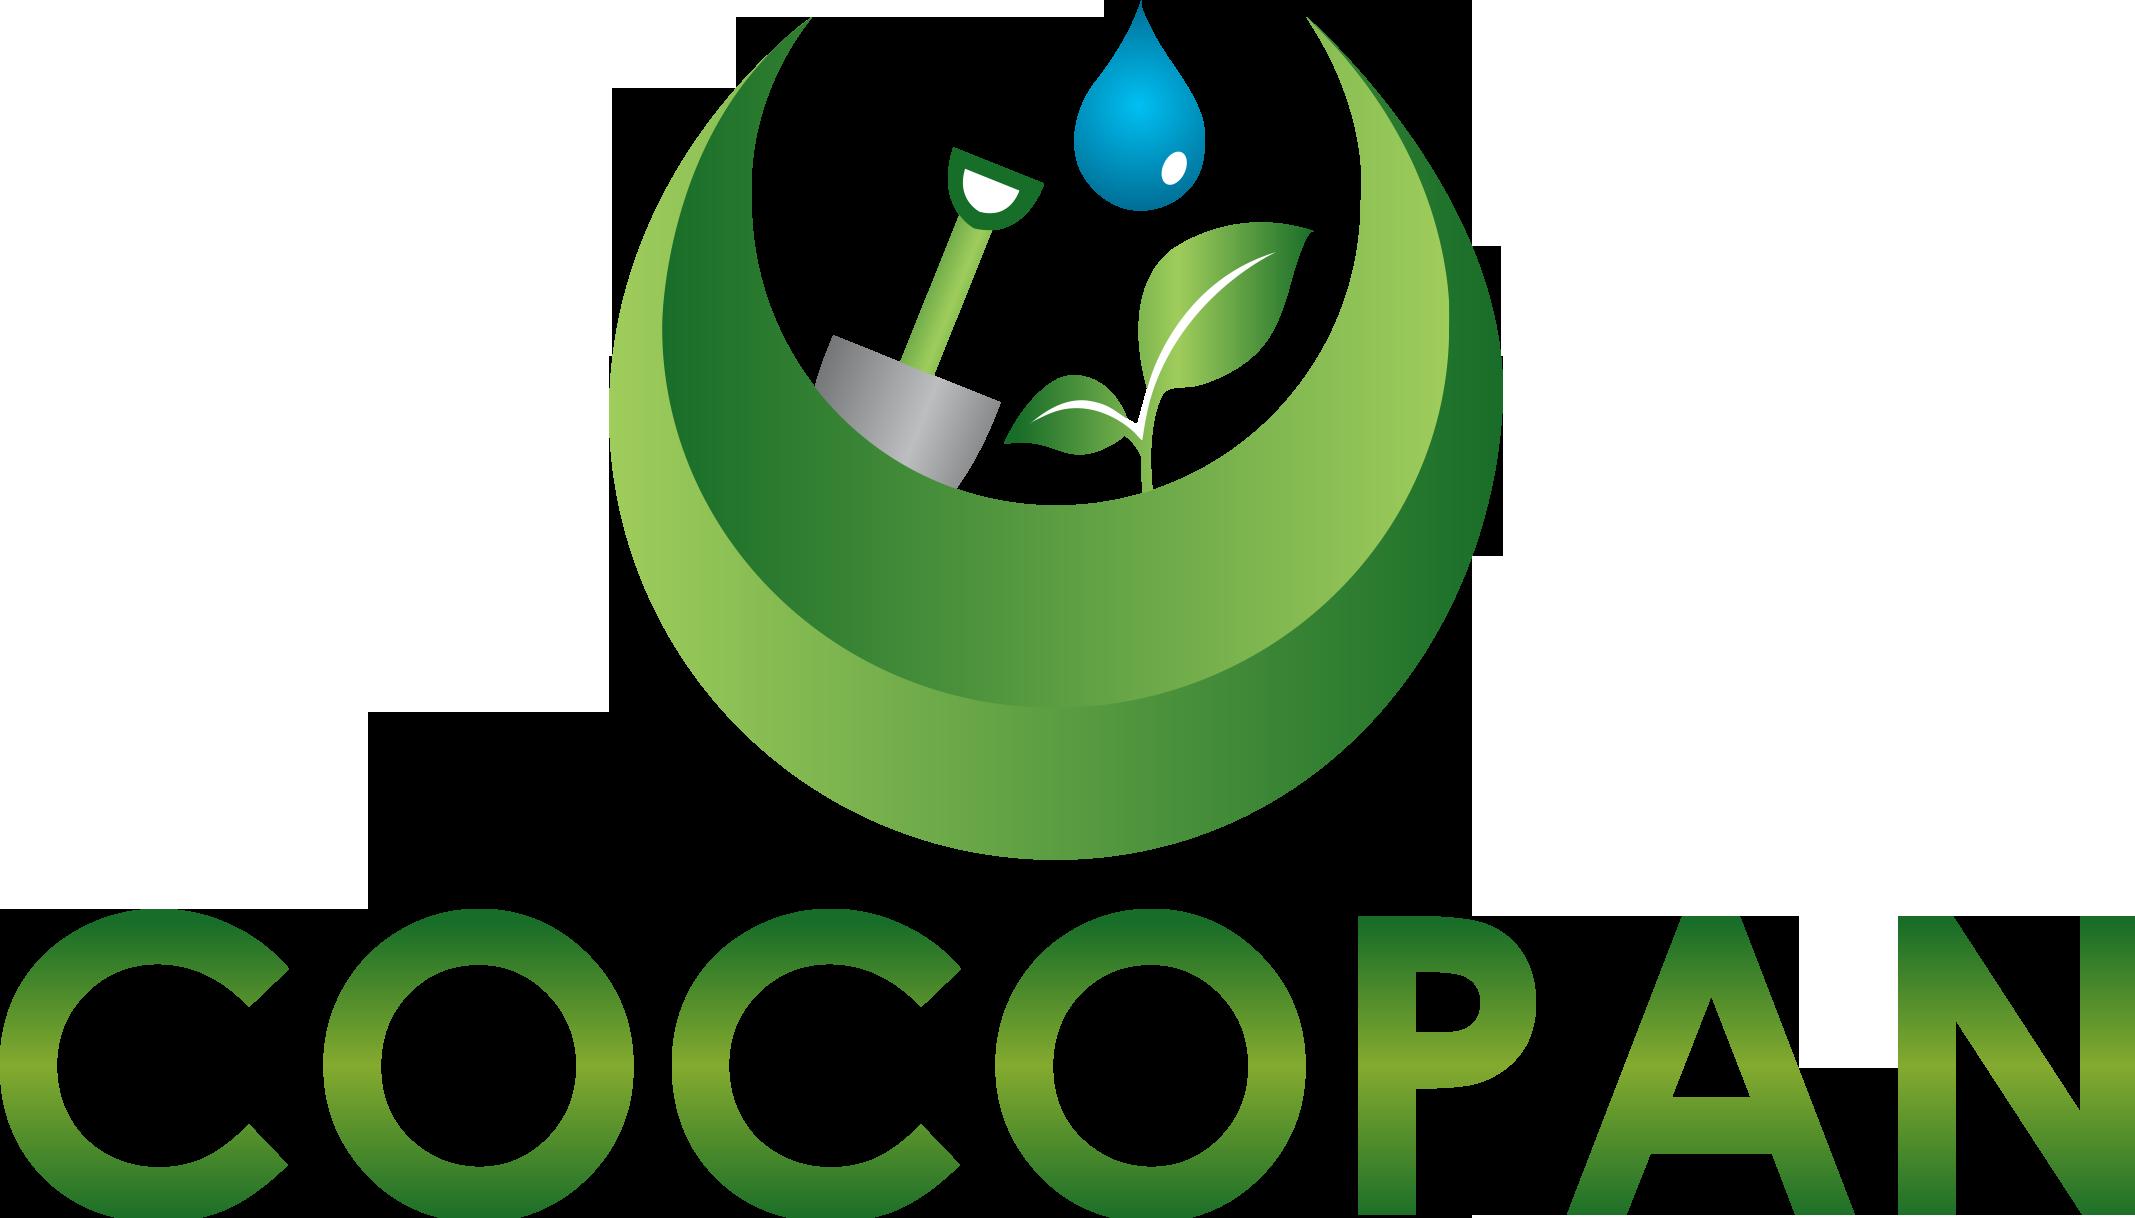 Cocopan